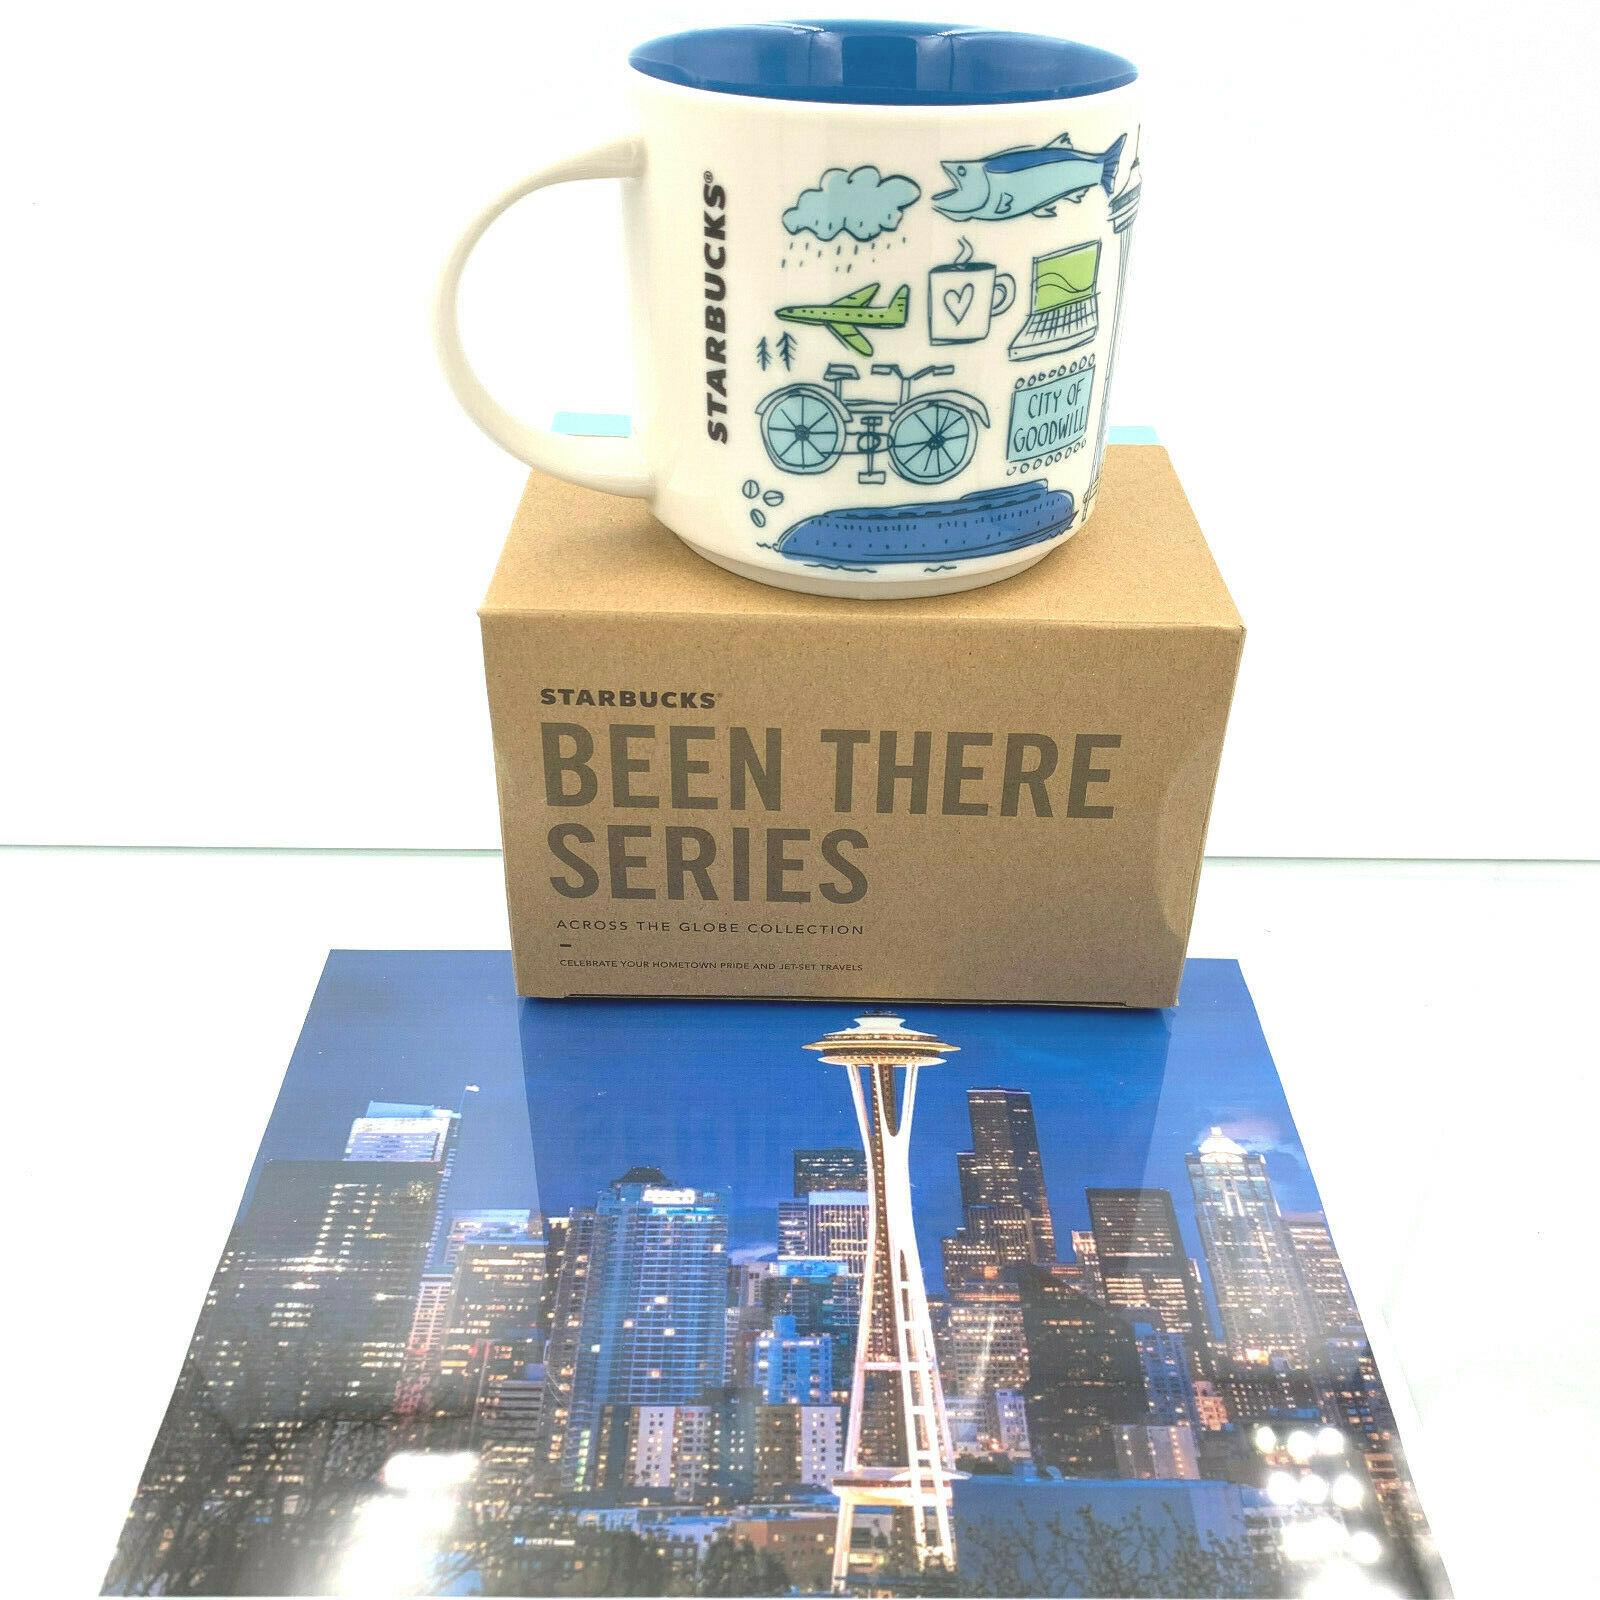 Starbucks Coffee Ceramic Mug Cup USA World Collection Coffee Tea Hot 14 oz Gift image 2